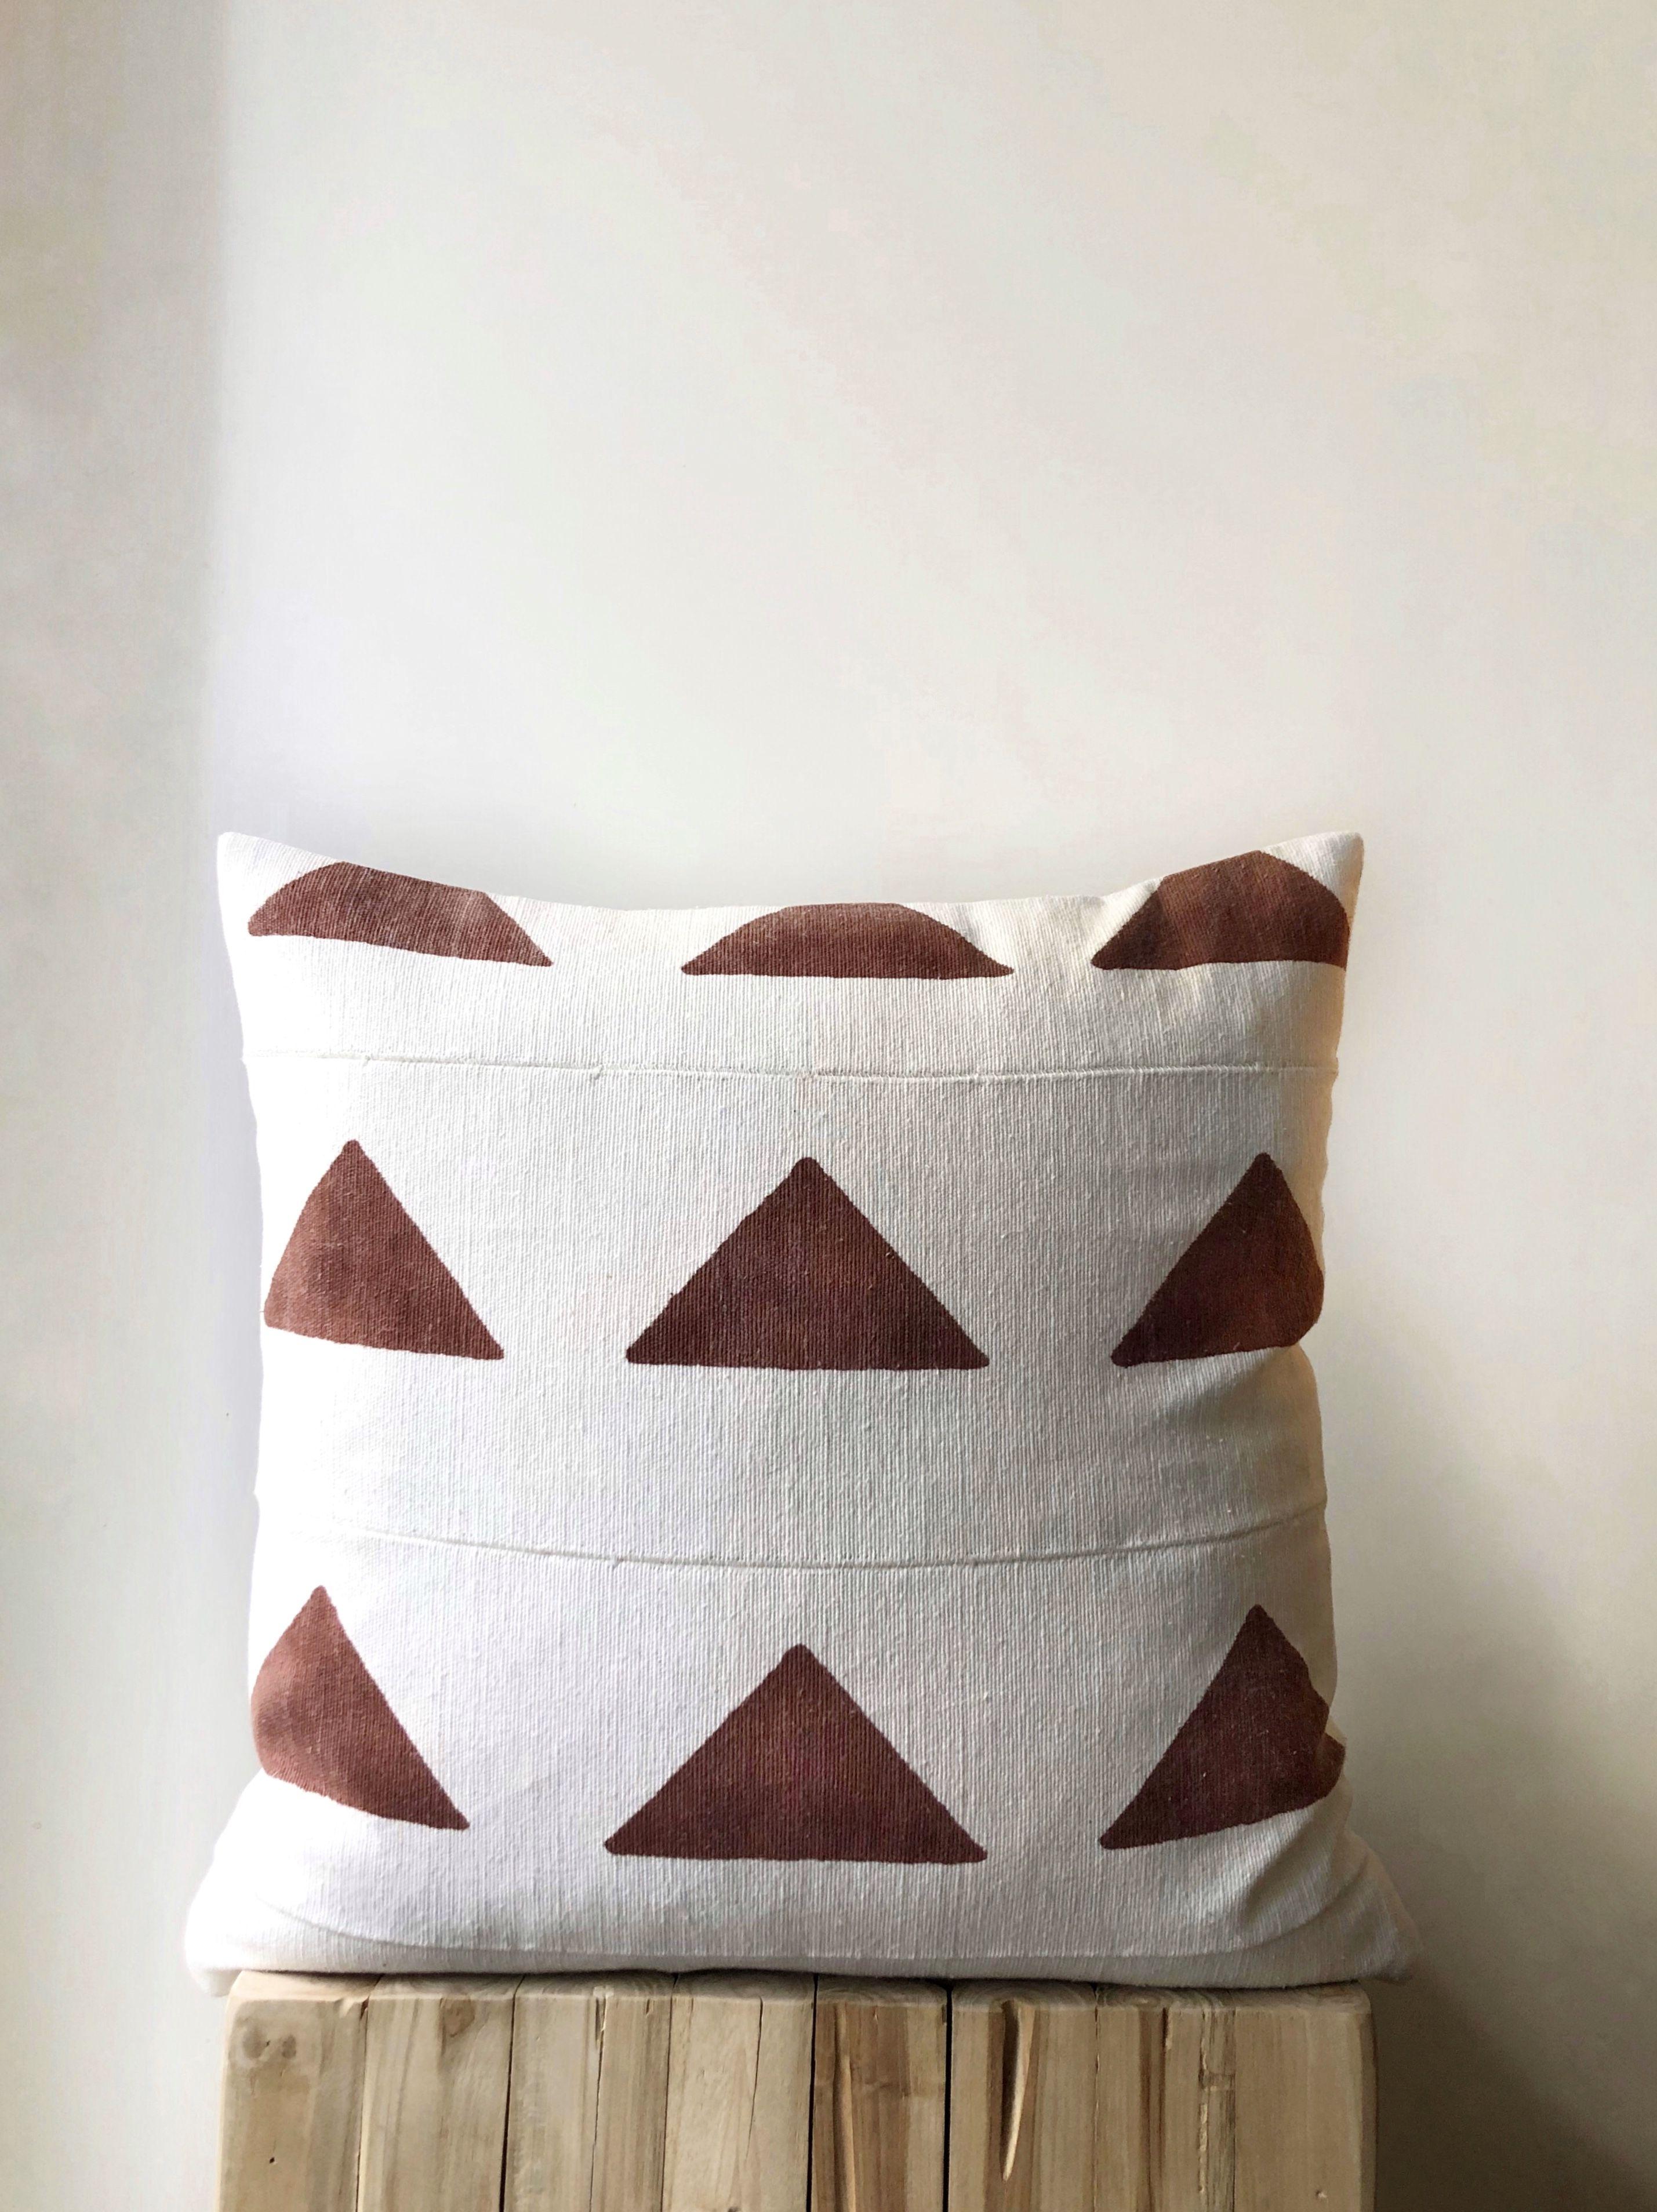 African Mudcloth Cushion With Rust Triangle Block Print Etsy Interiordesign Bohodecor Bohopillow Mudclo African Mudcloth Pillow Mud Cloth Mudcloth Pillow